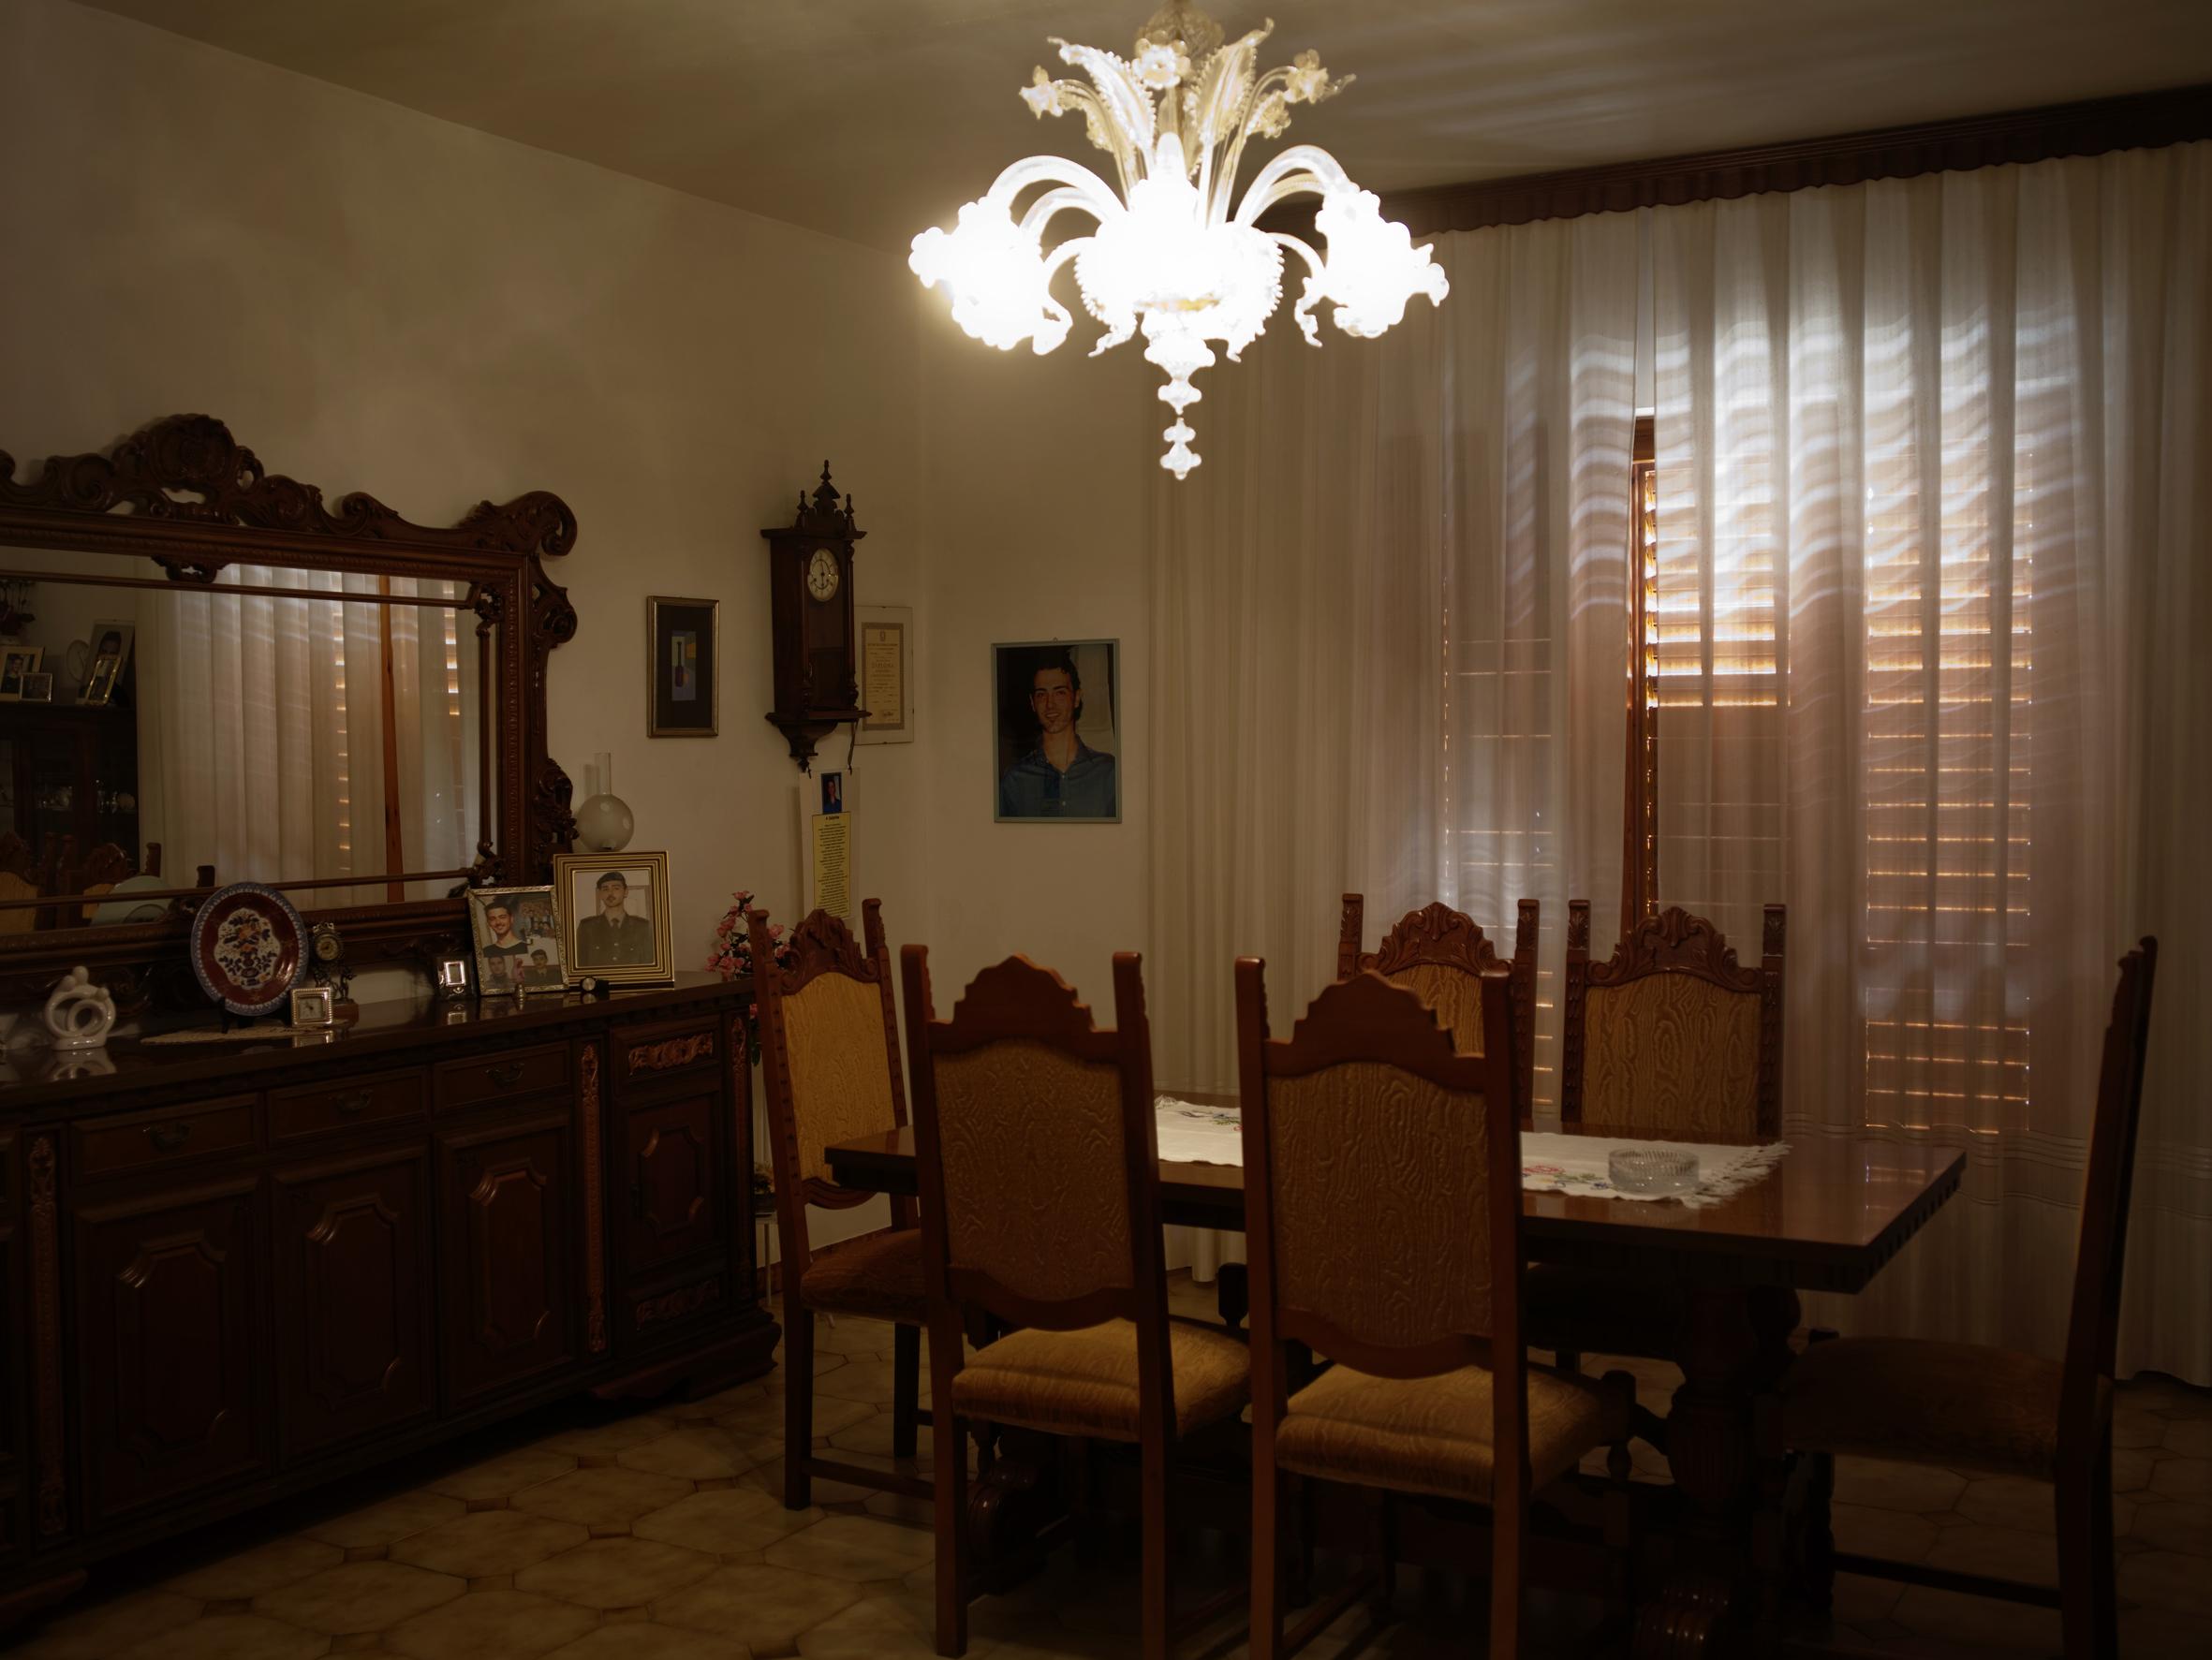 Dining room, Palizzi Marina, Reggio Calabria, 2011